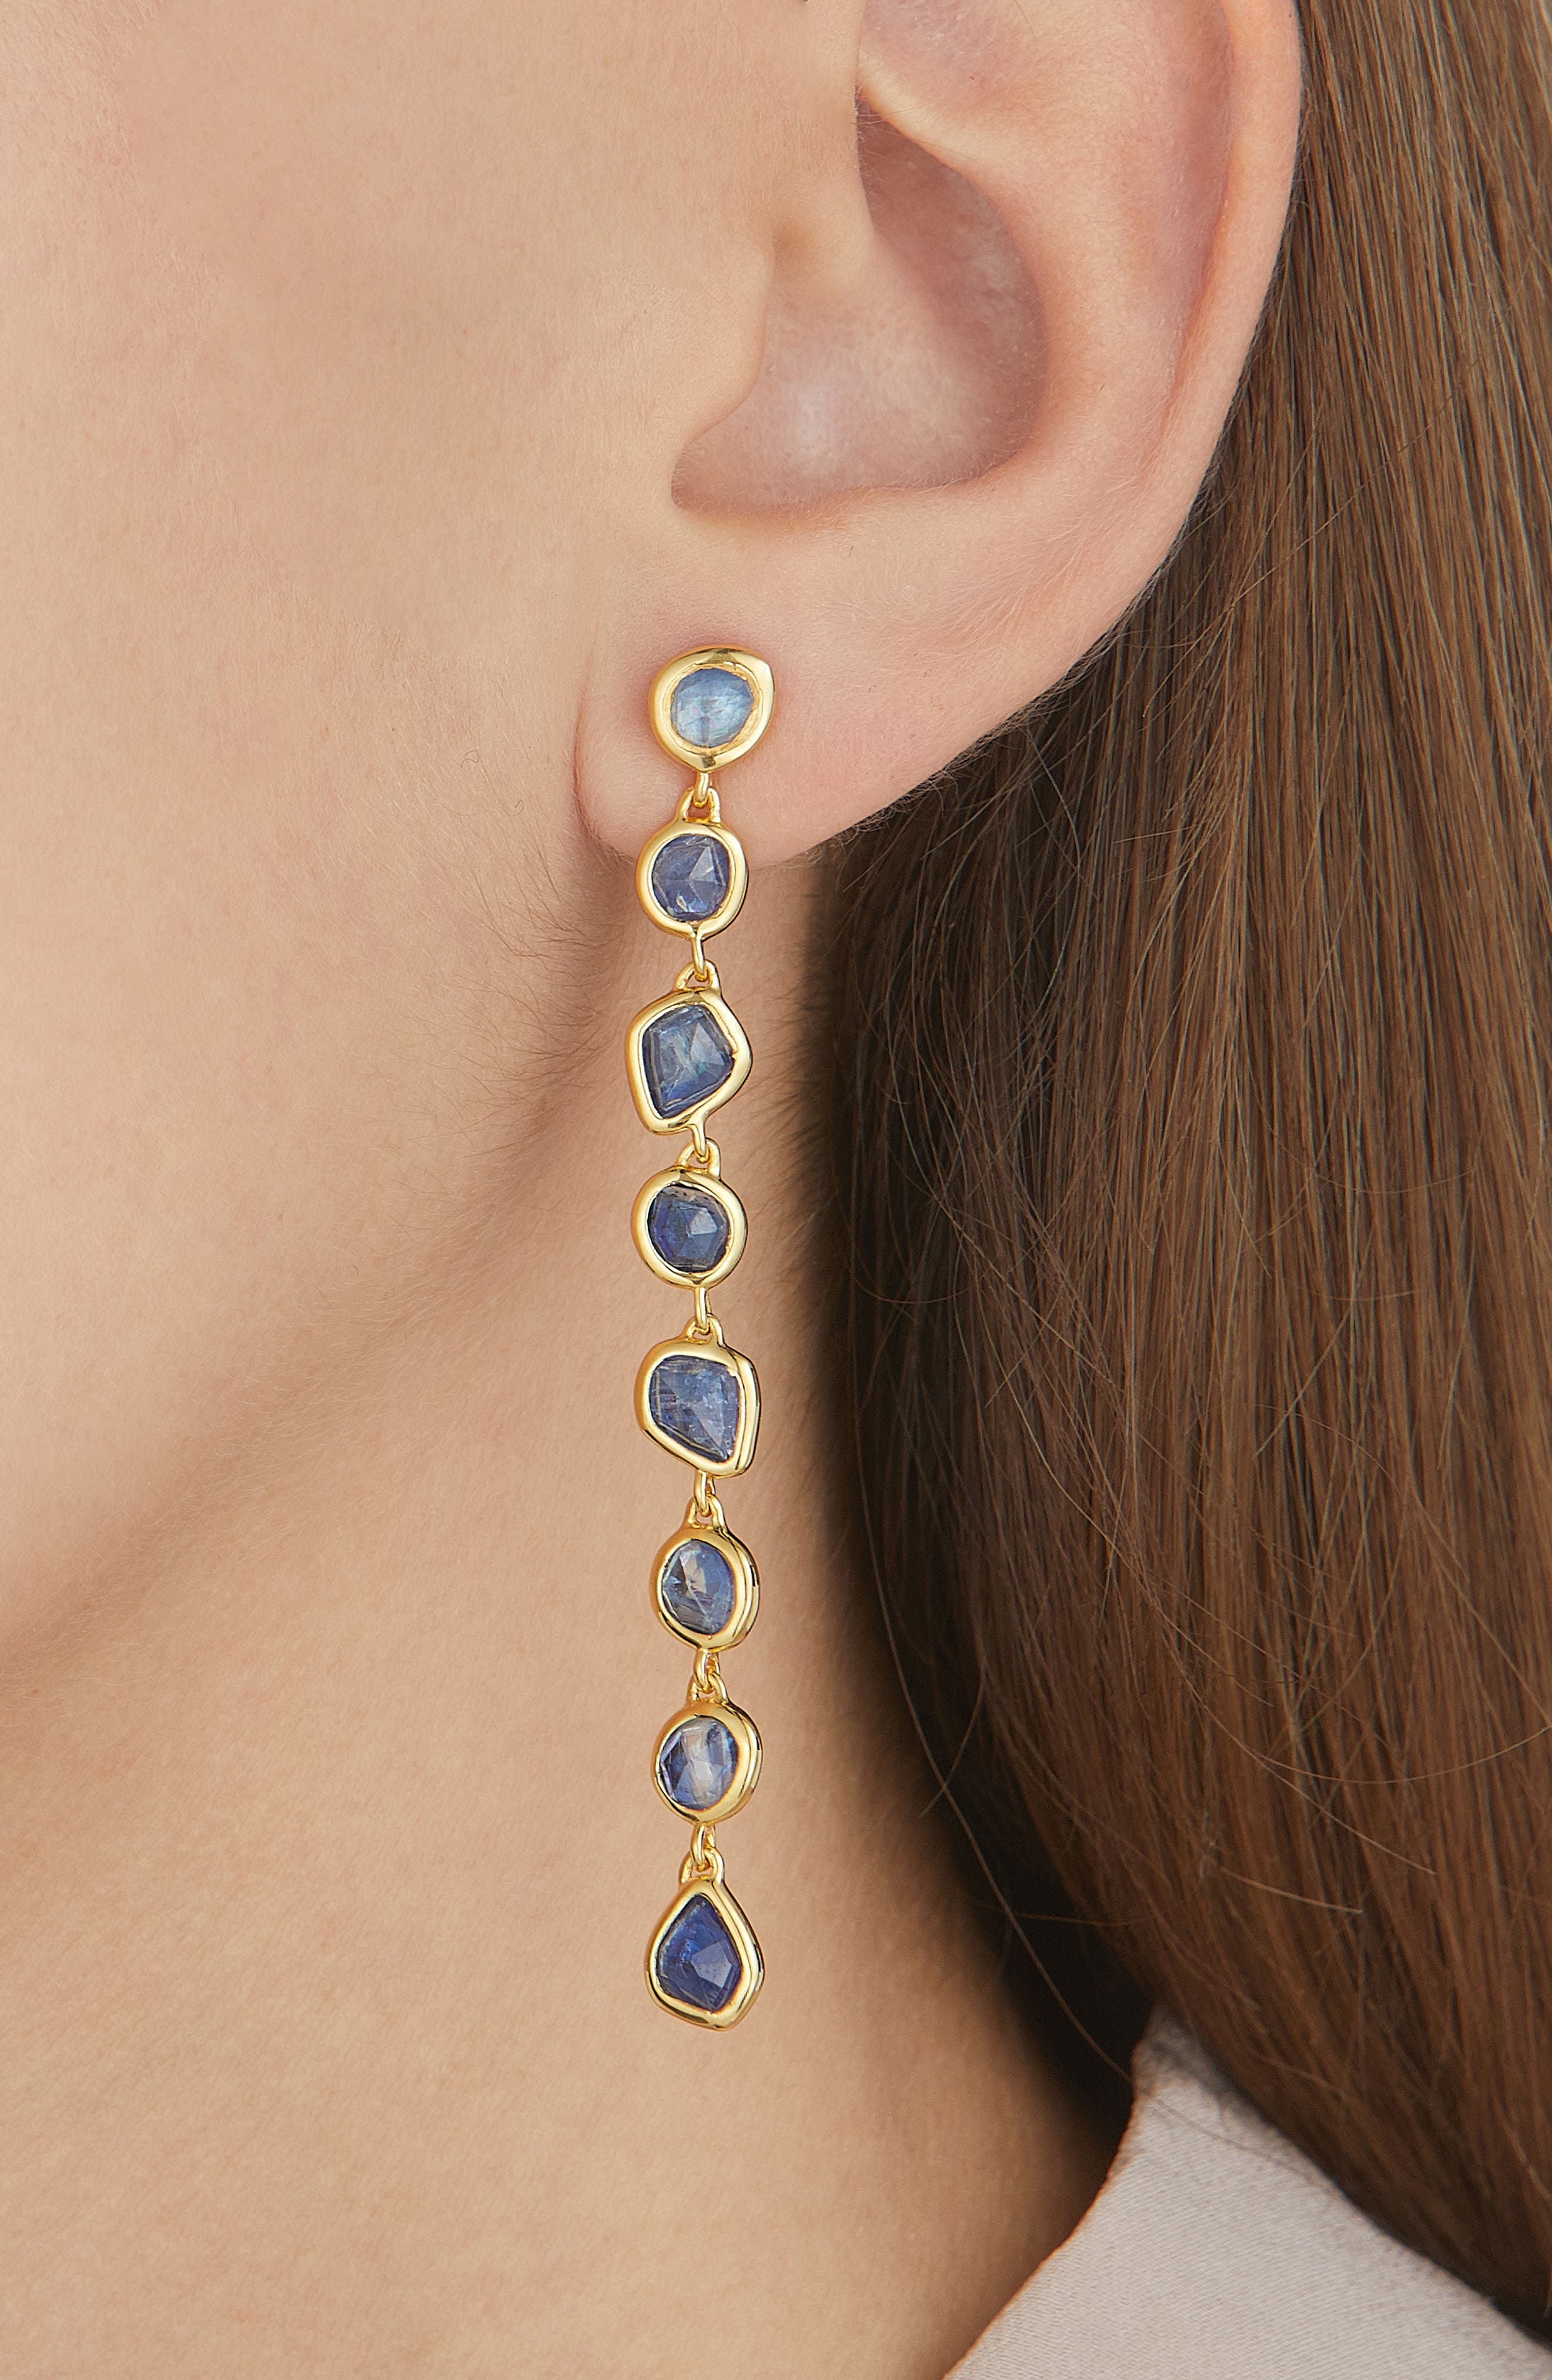 Siren Mini Nugget Earrings,                             Alternate thumbnail 2, color,                             Gold/ Kyanite